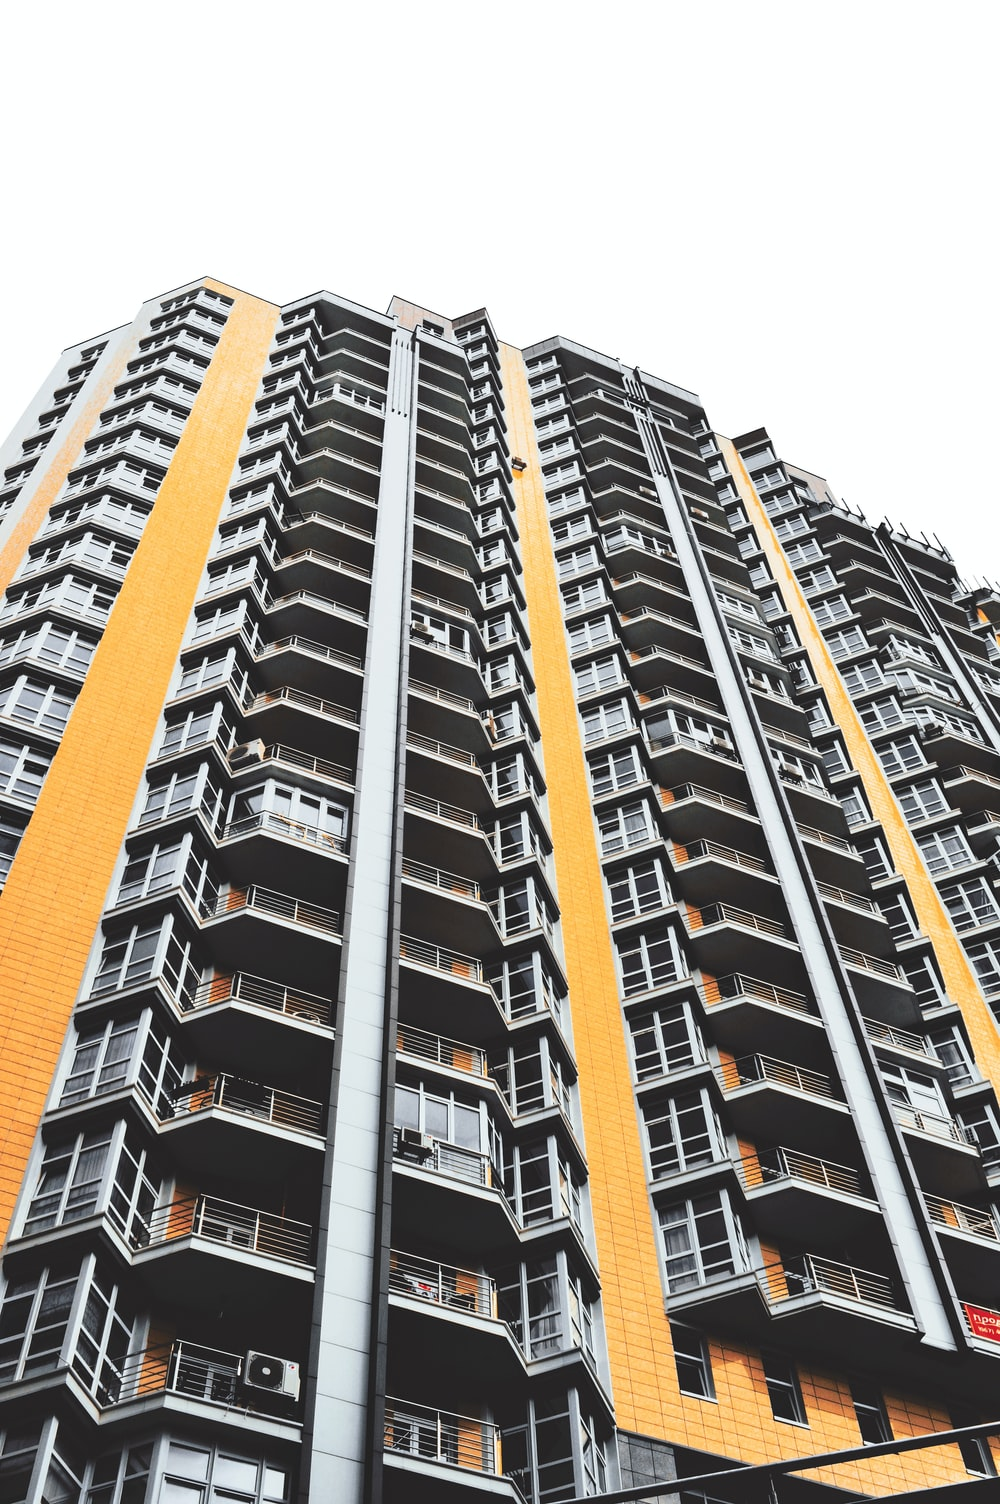 gray and orange concrete high-rise building